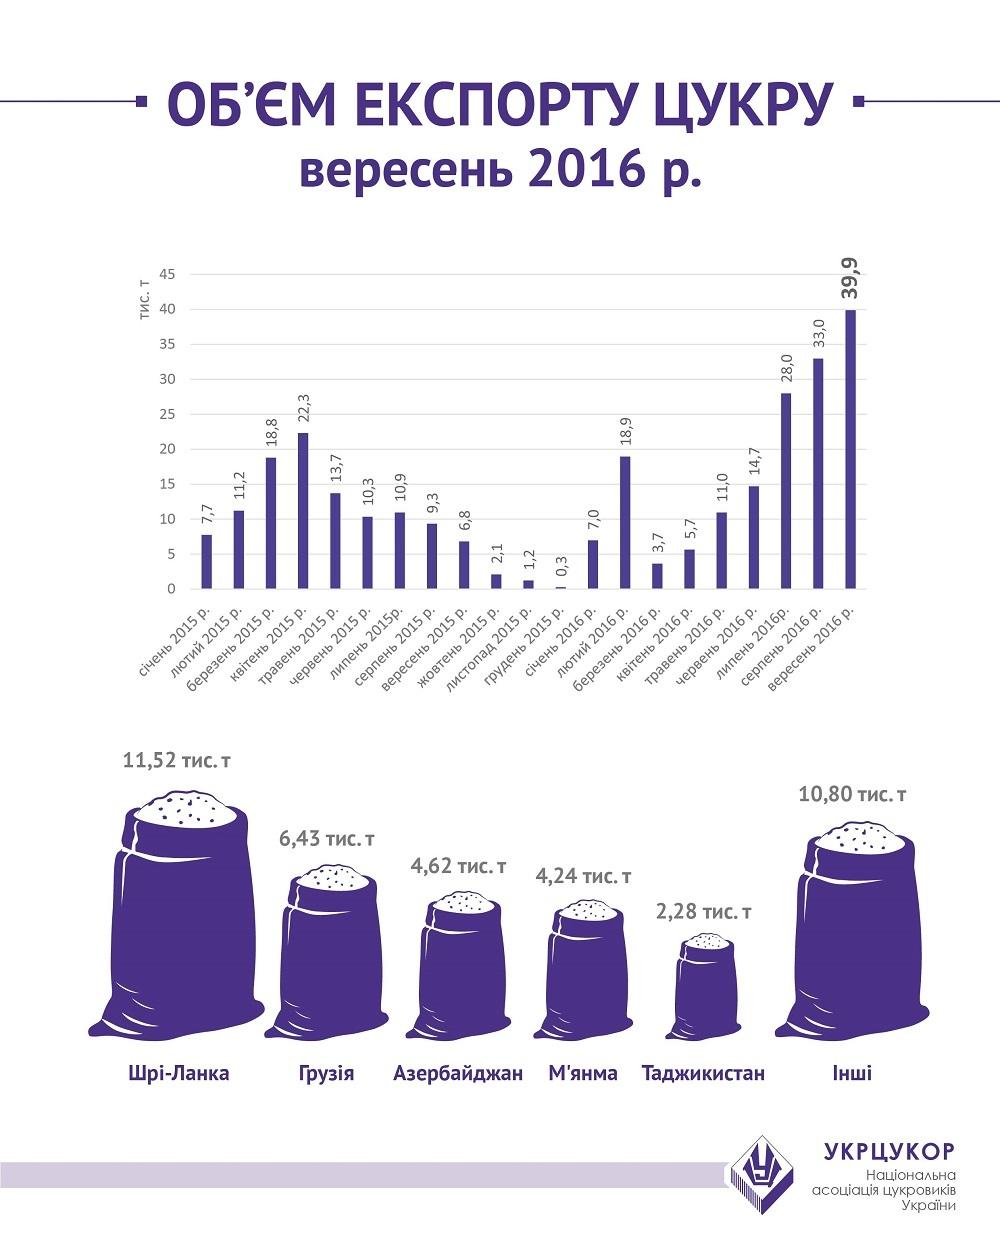 Украина побила пятилетний рекорд экспорта сахара: инфографика